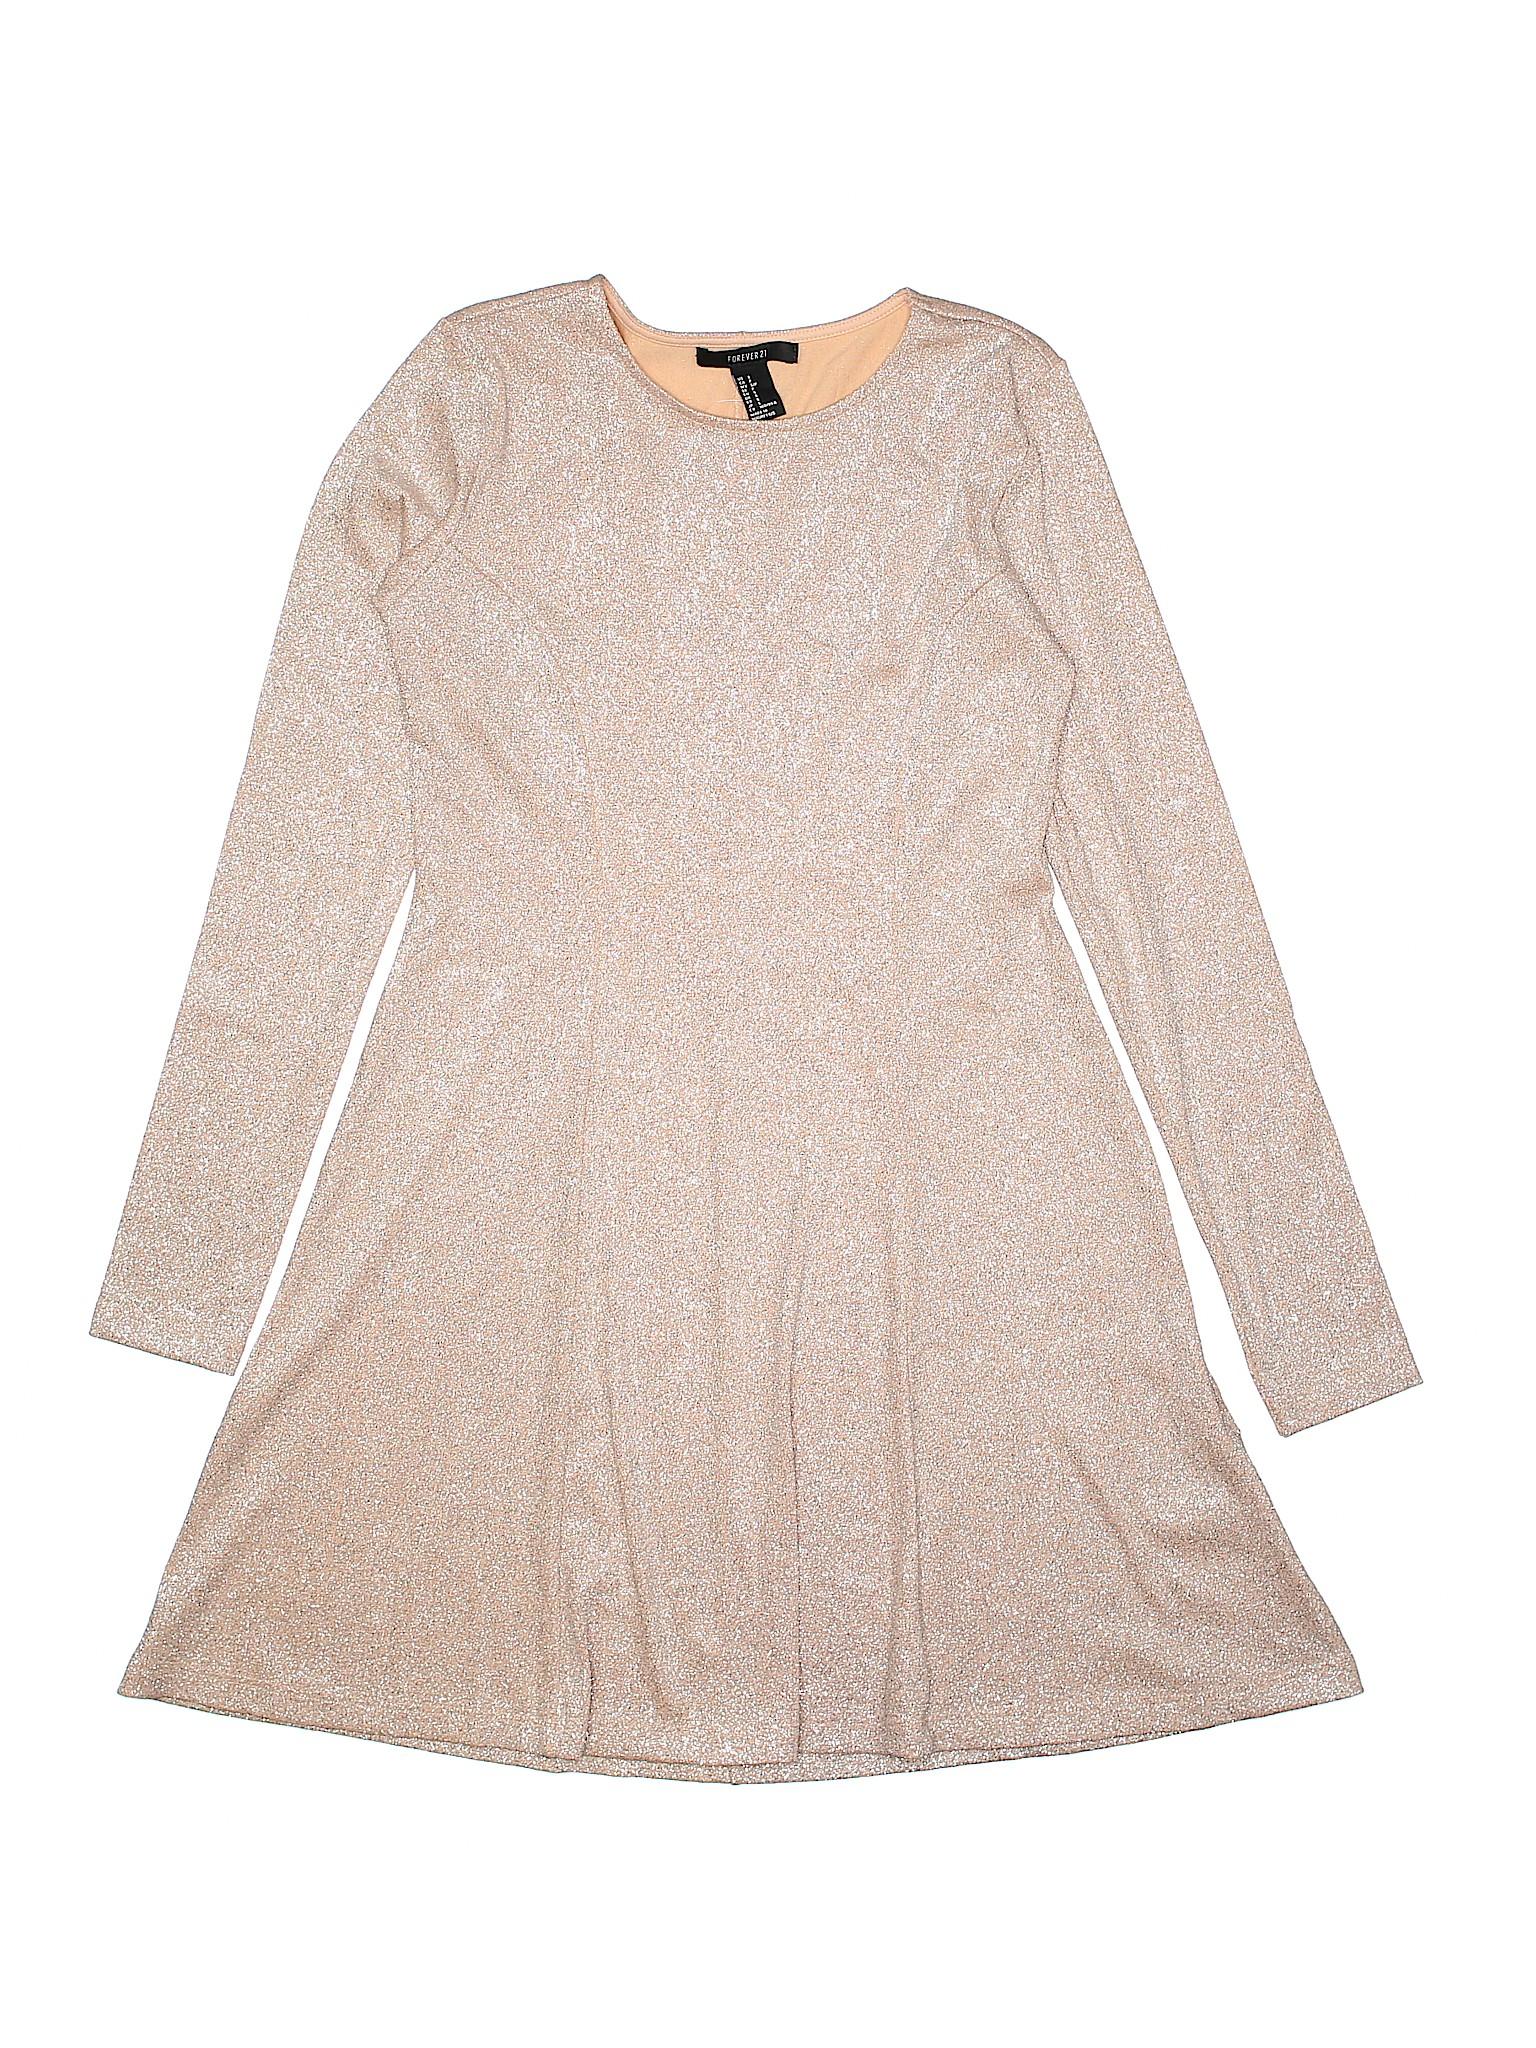 Dress 21 winter Boutique Forever Casual pExaIqqPw